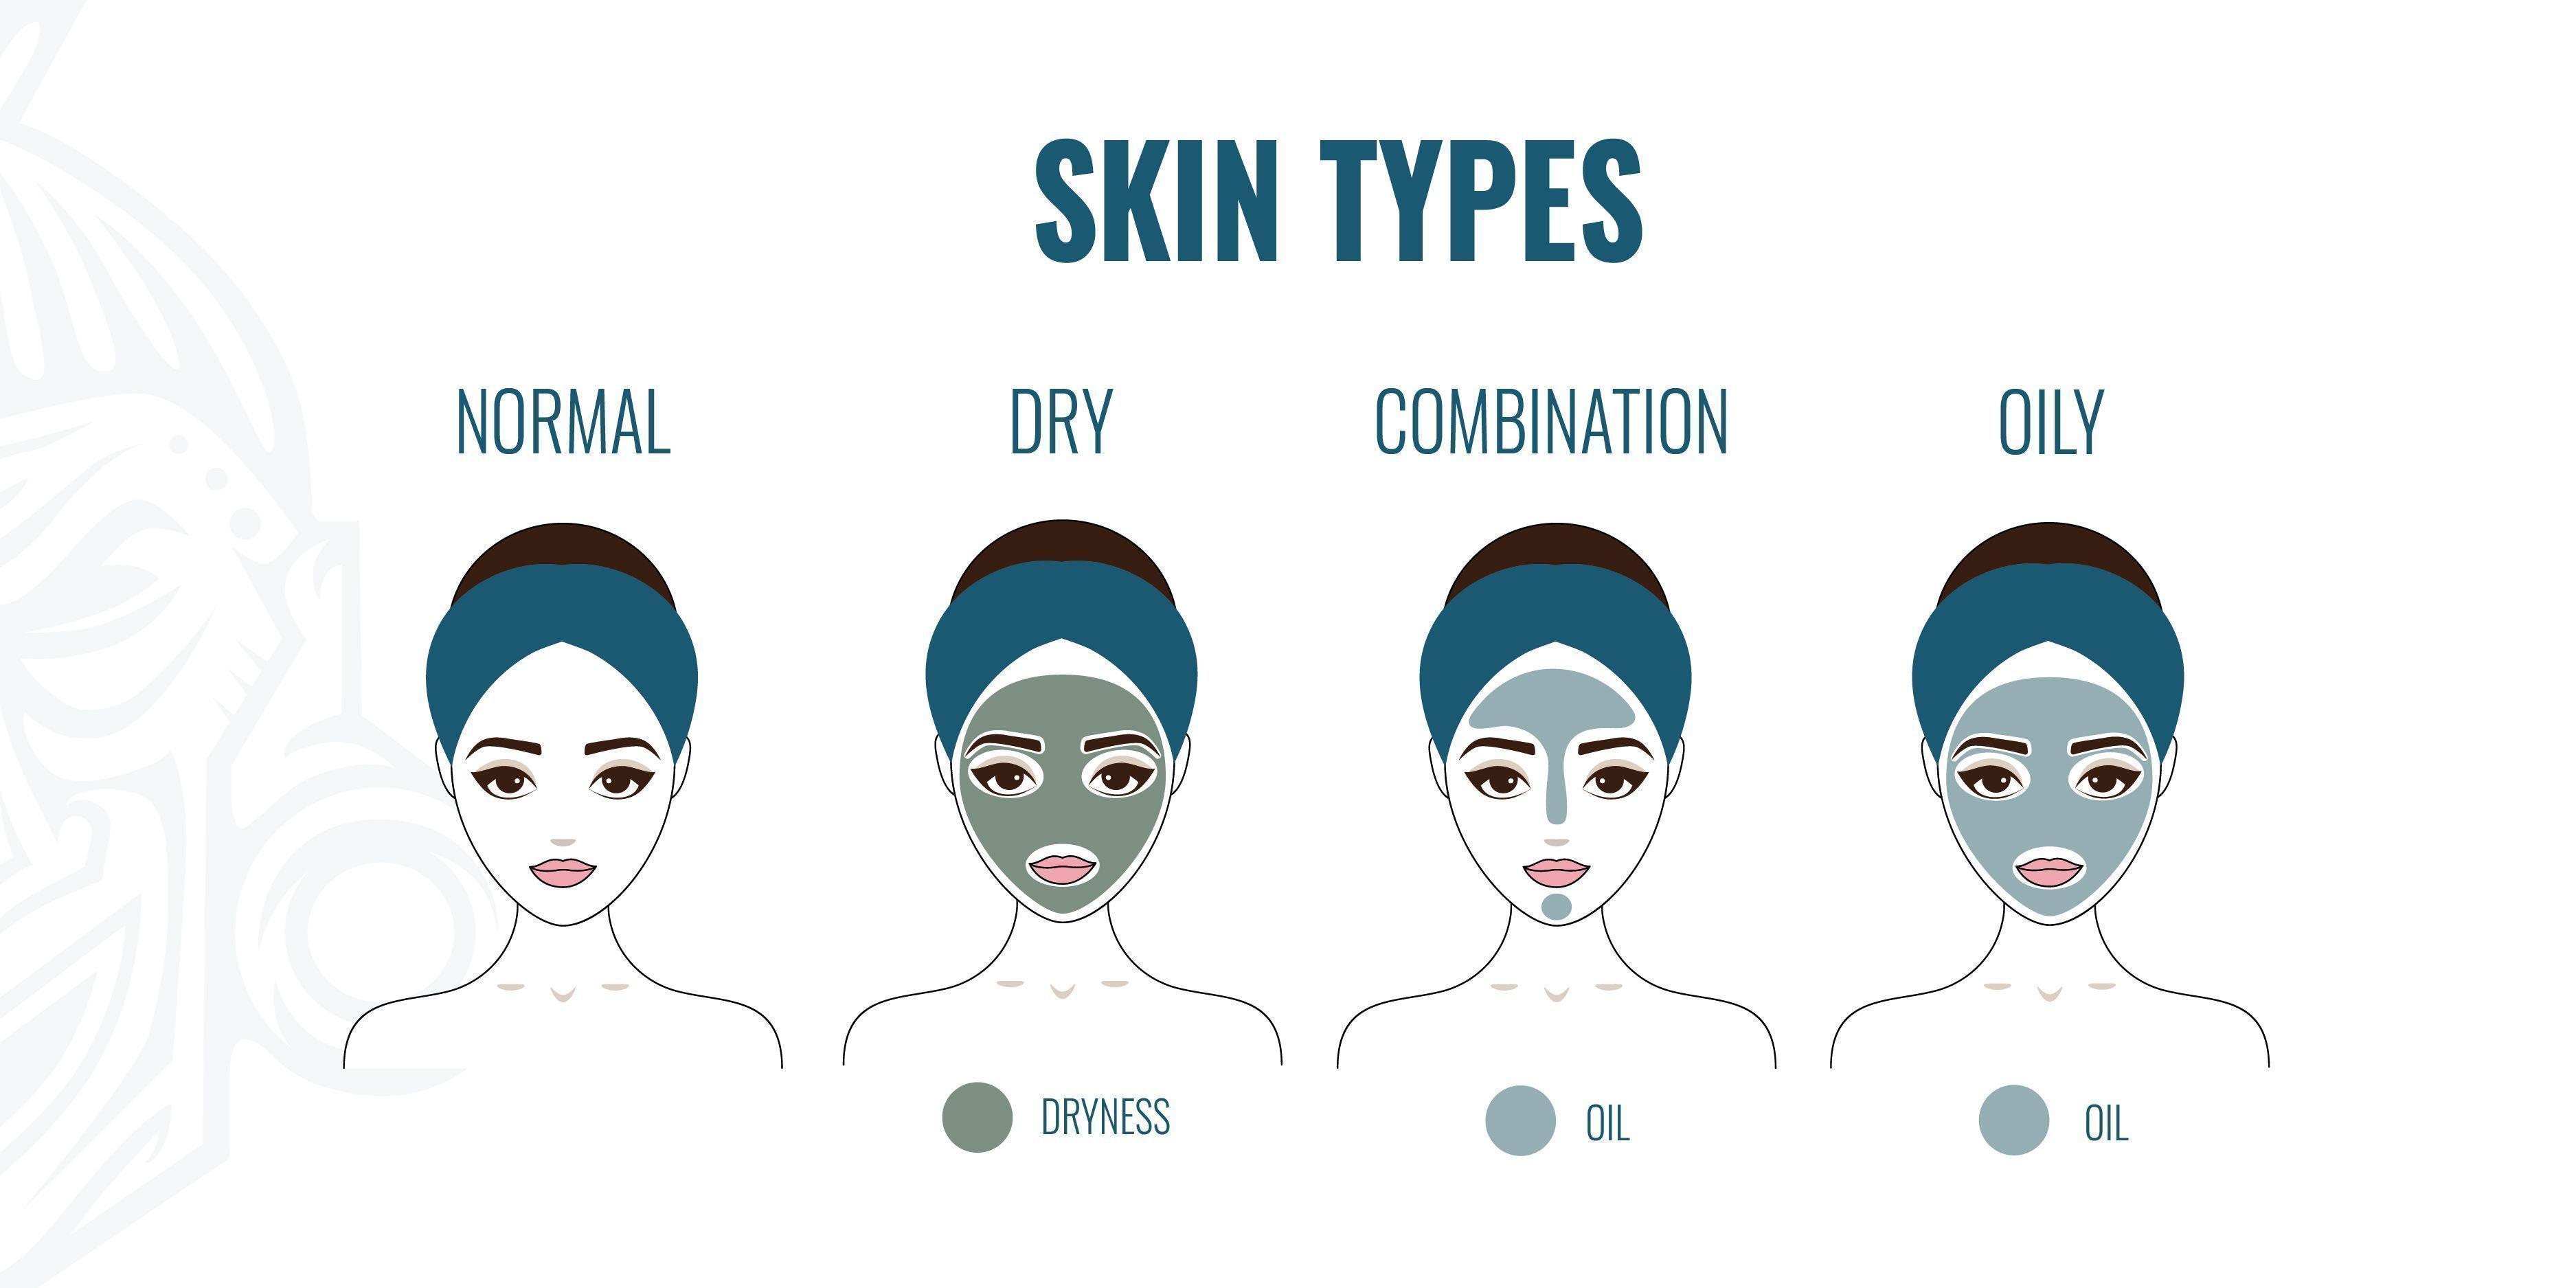 CBD Cosmetics and Skin Types